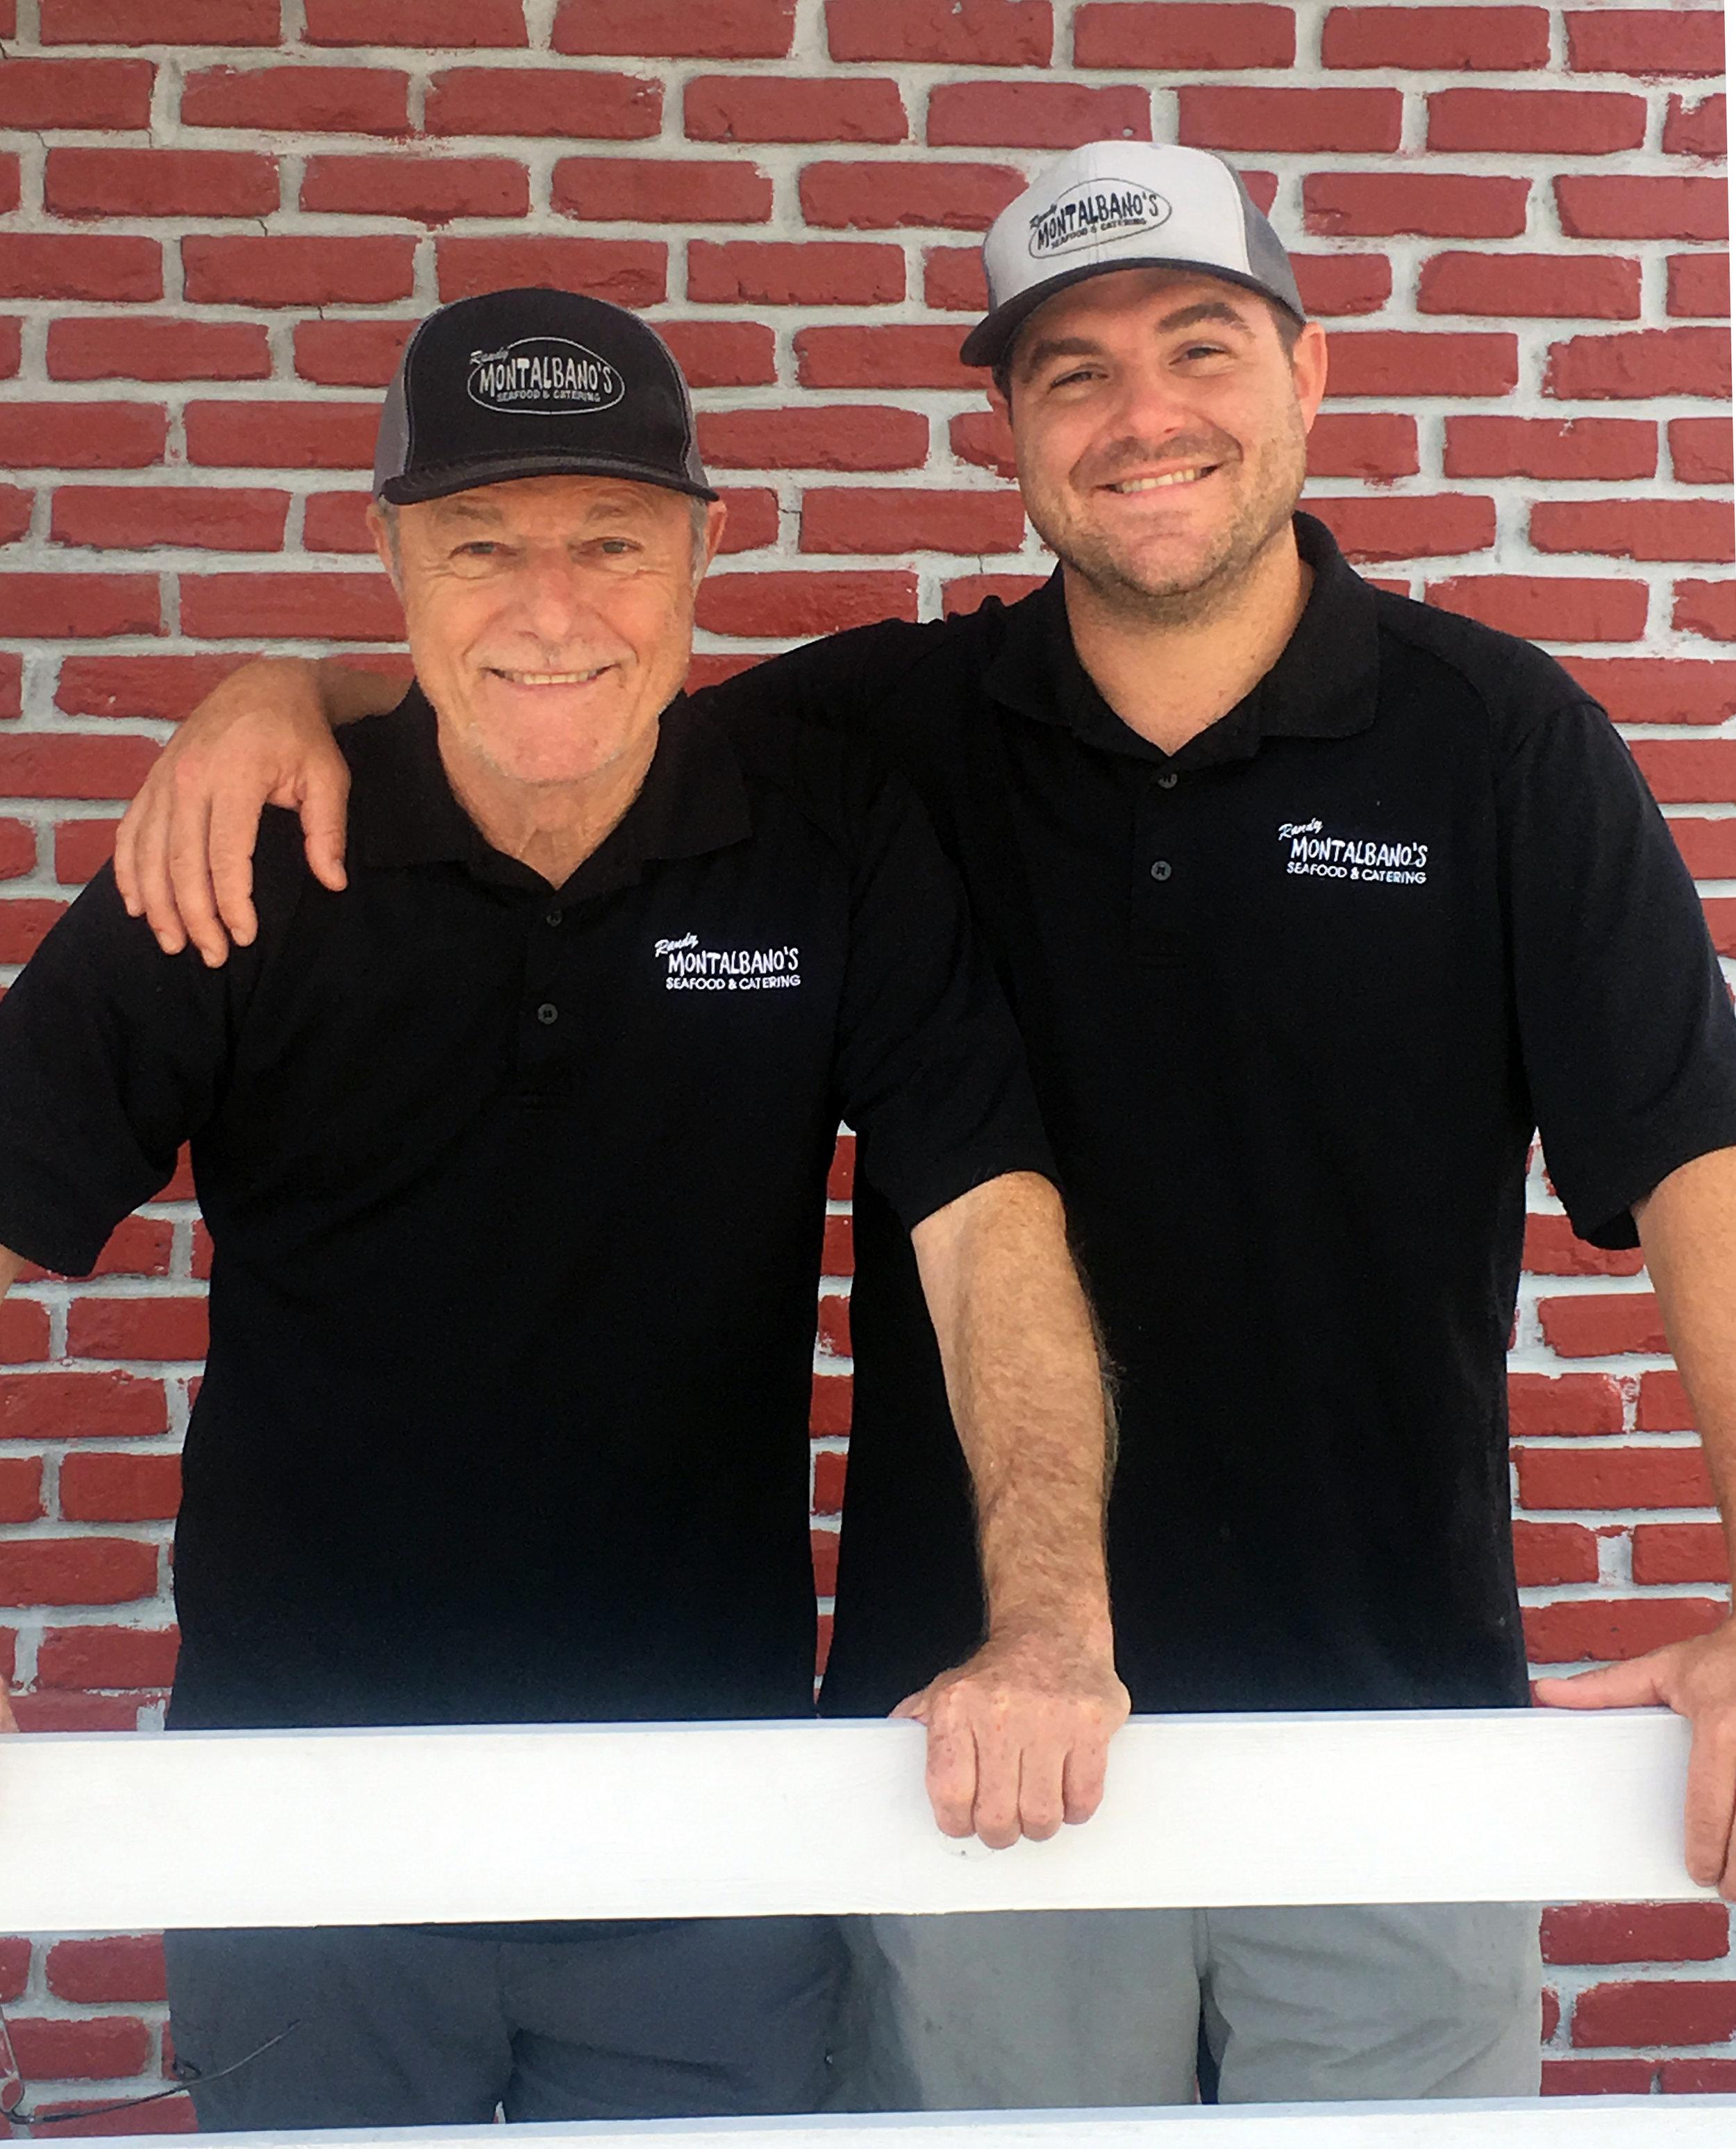 Randy Sr. and Randy Jr.